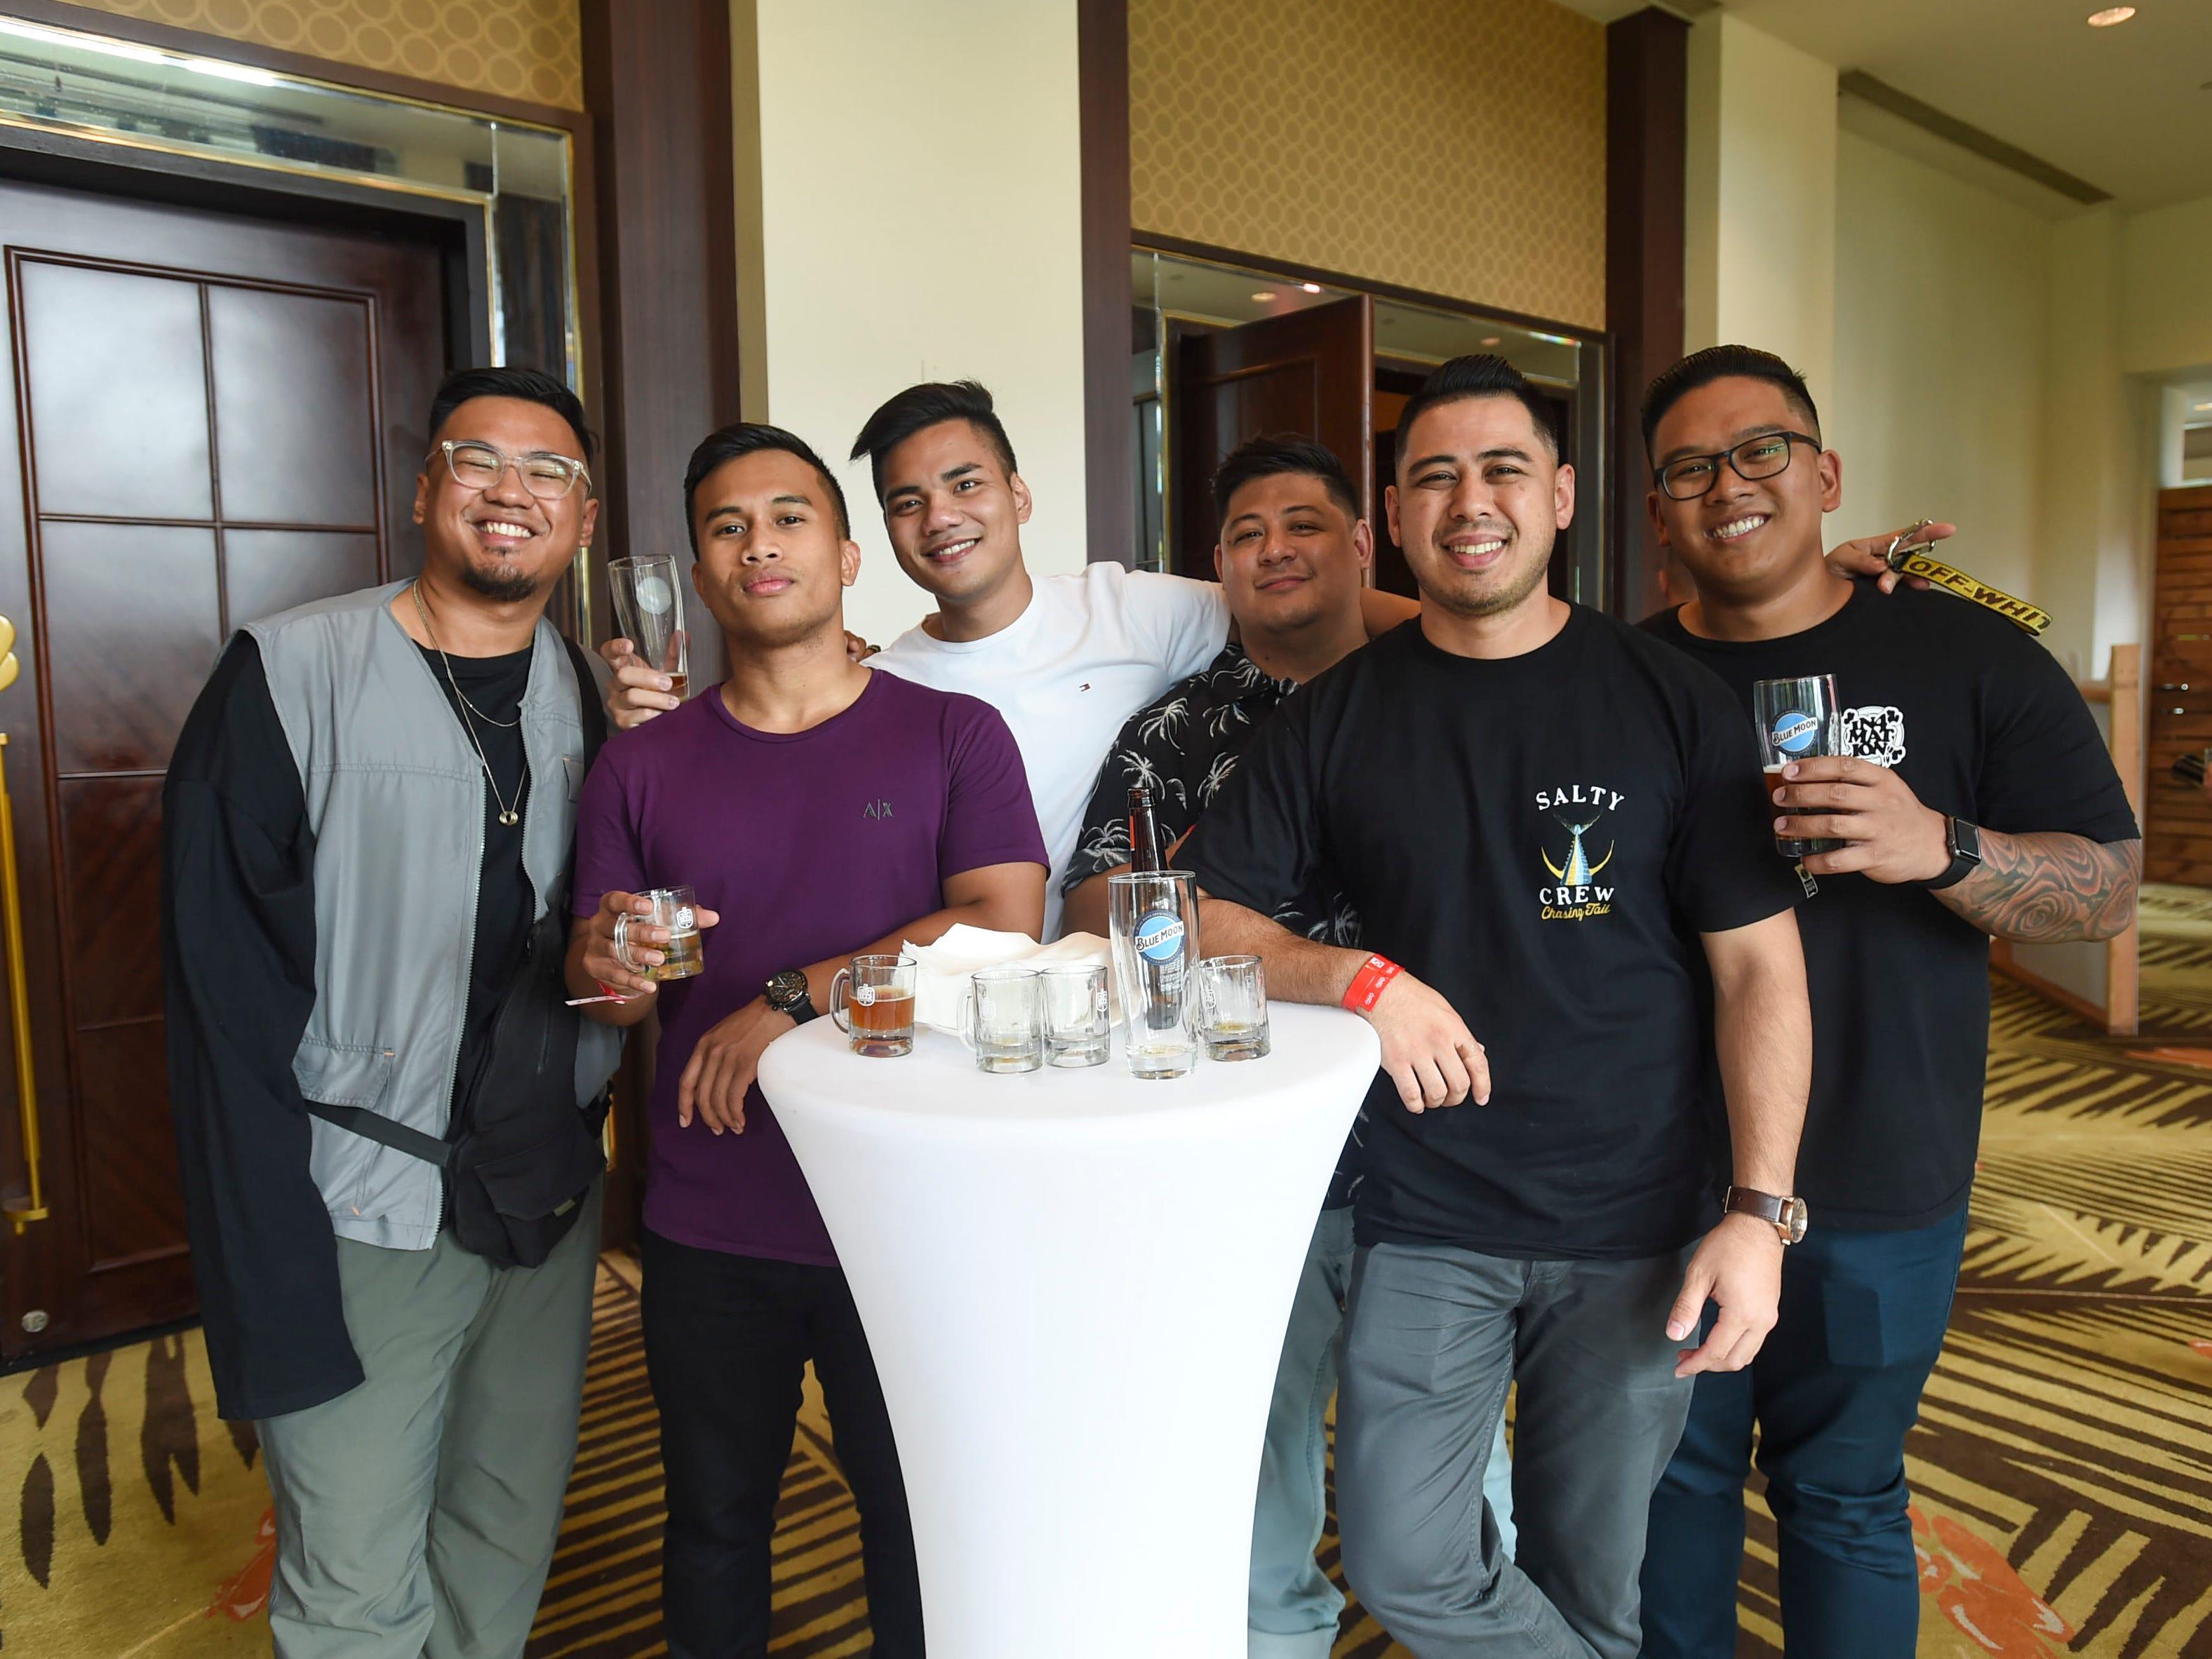 The Circle K Craft Beer Festival was held at the Sheraton Laguna Guam Resort, Sept. 29, 2018. From left: Kevin Quijano, Joaquin Arriola Bellis, Leo Acain, Handsom Calvo, Ryan Arriola, and Matthew Apelo.